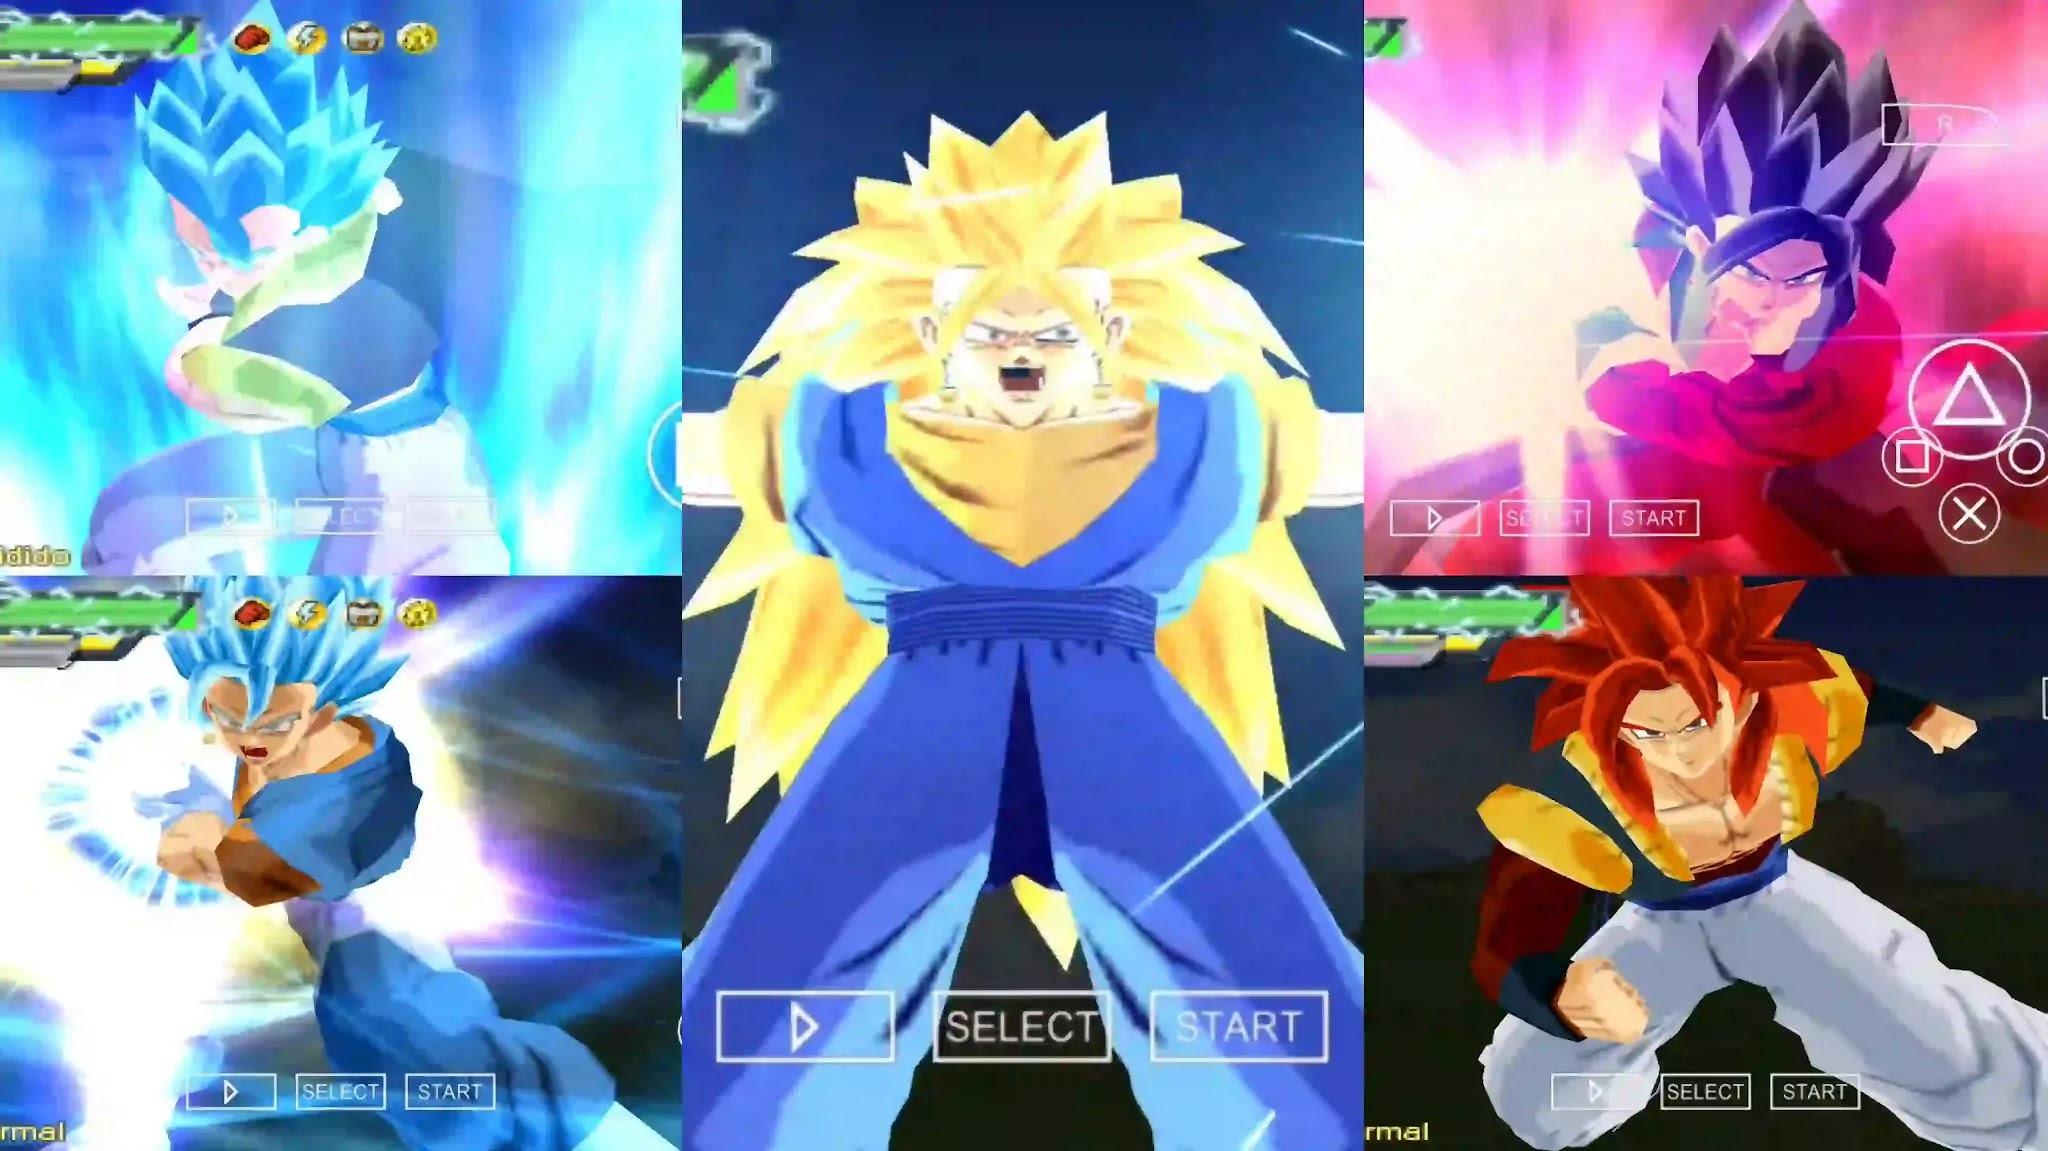 Dragon Ball Super Gogeta and Vegito